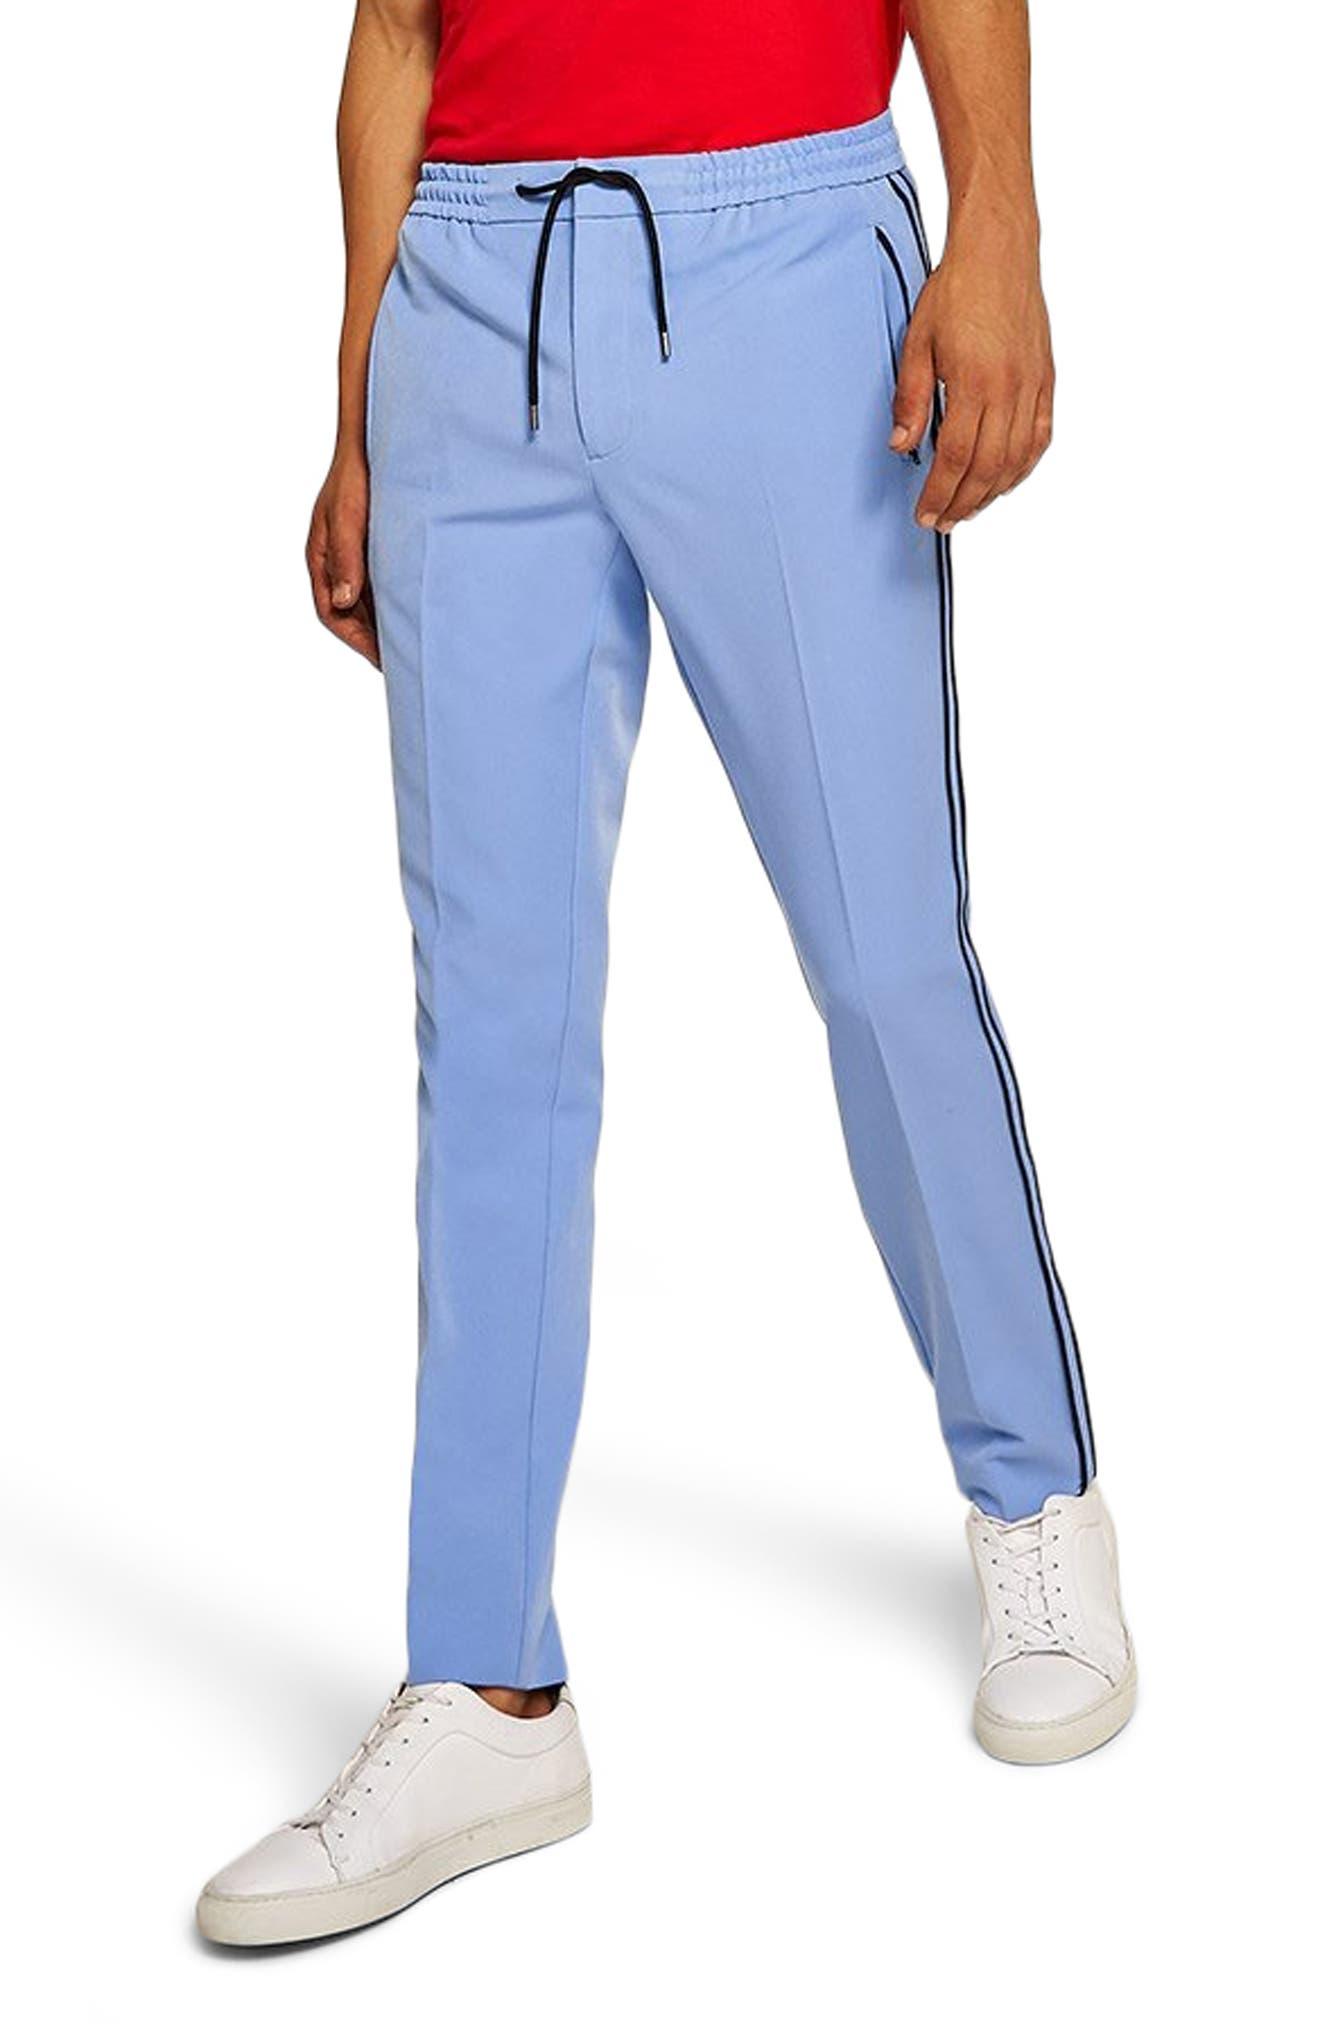 Binding Skinny Fit Jogger Pants,                             Main thumbnail 1, color,                             400